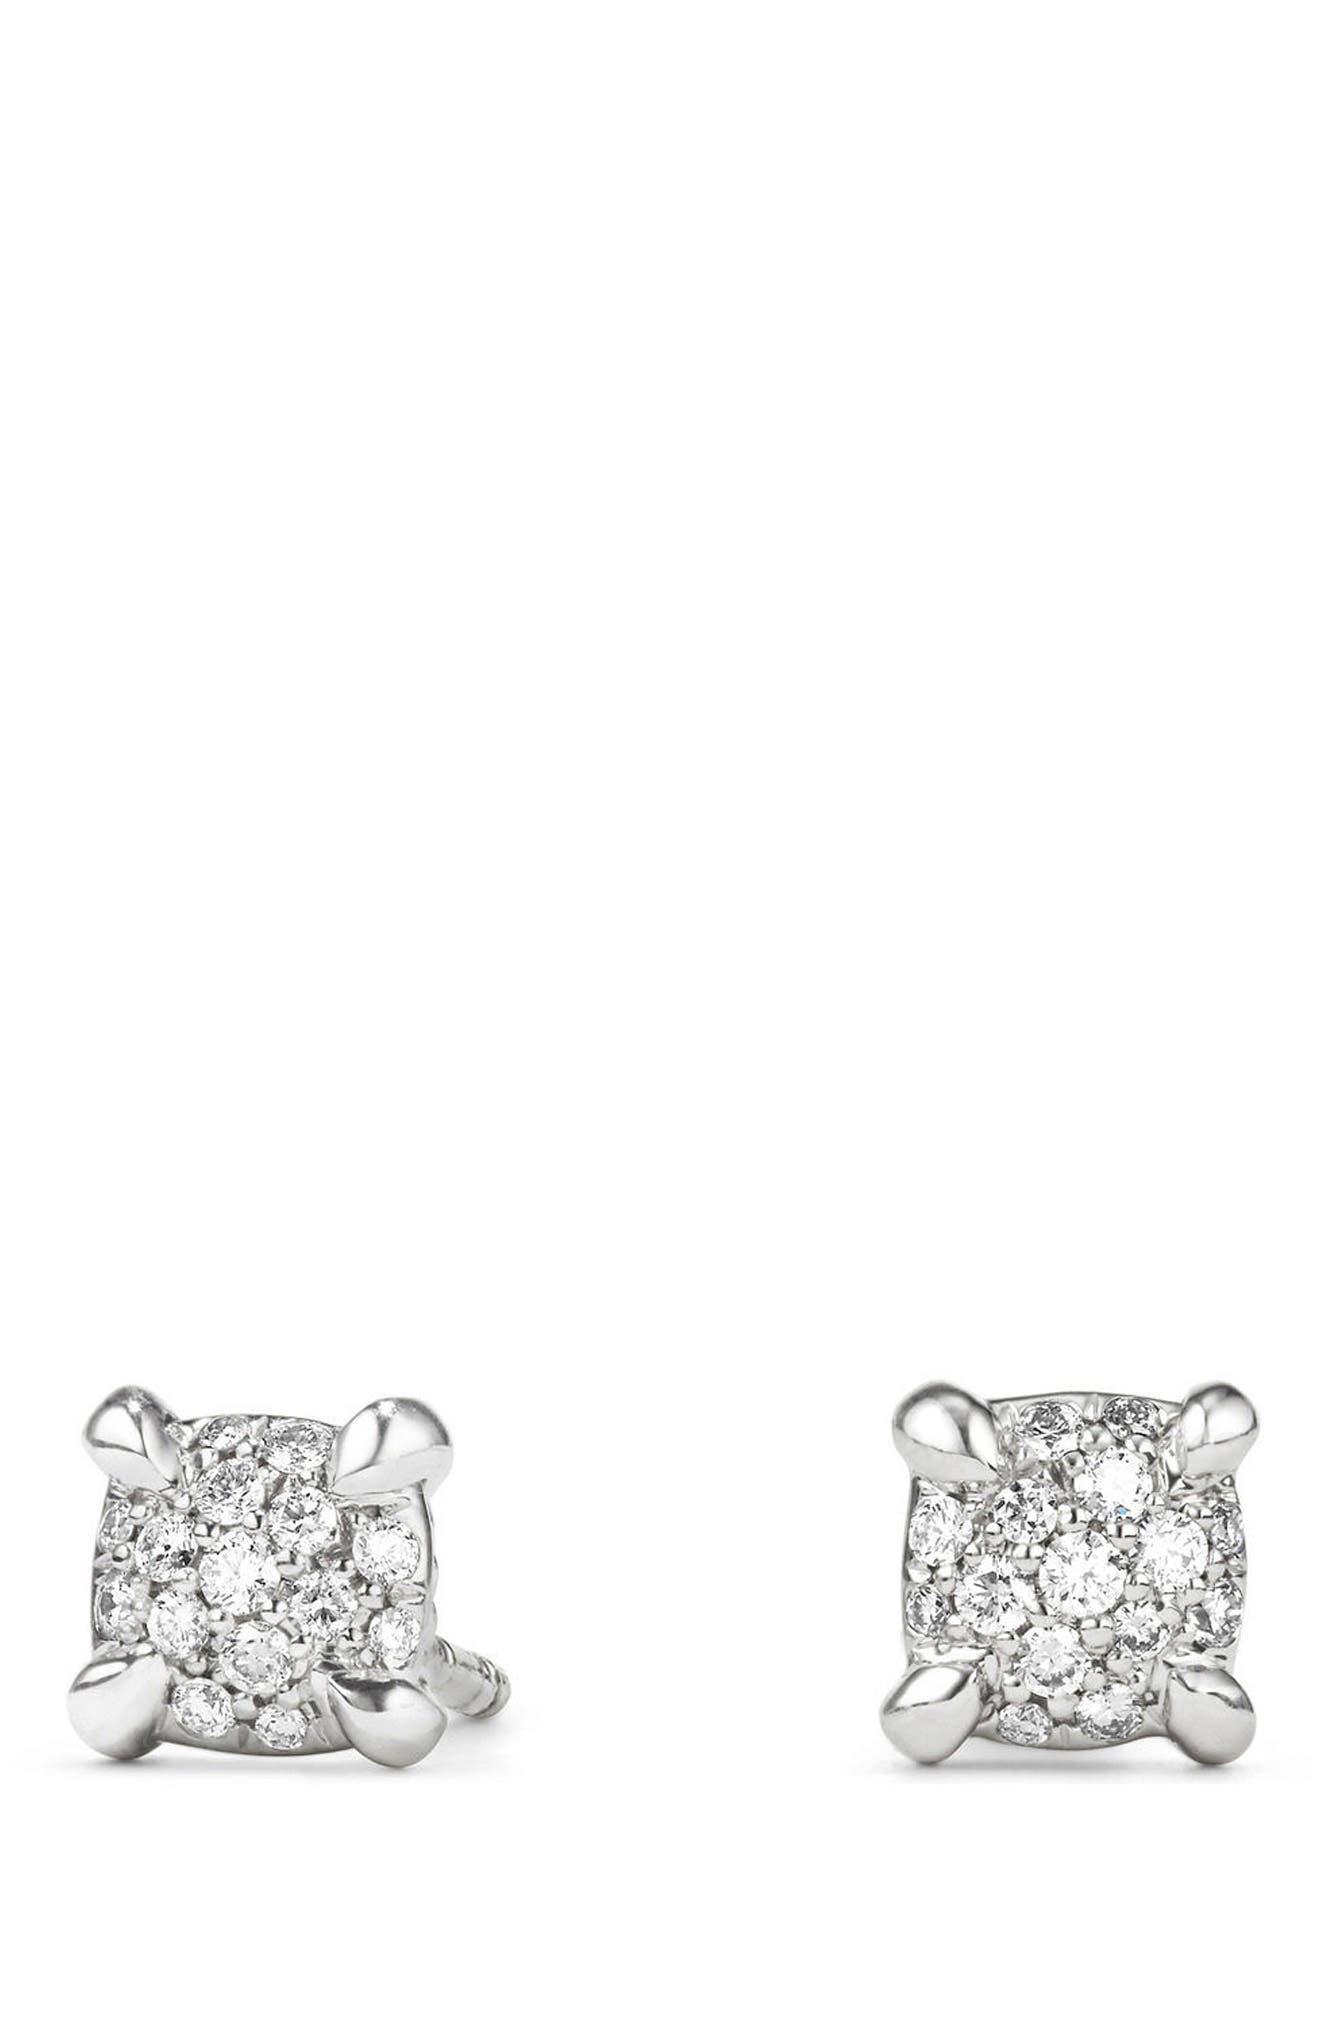 DAVID YURMAN Châtelaine Stud Earrings with Diamonds, Main, color, WHITE GOLD/ DIAMOND